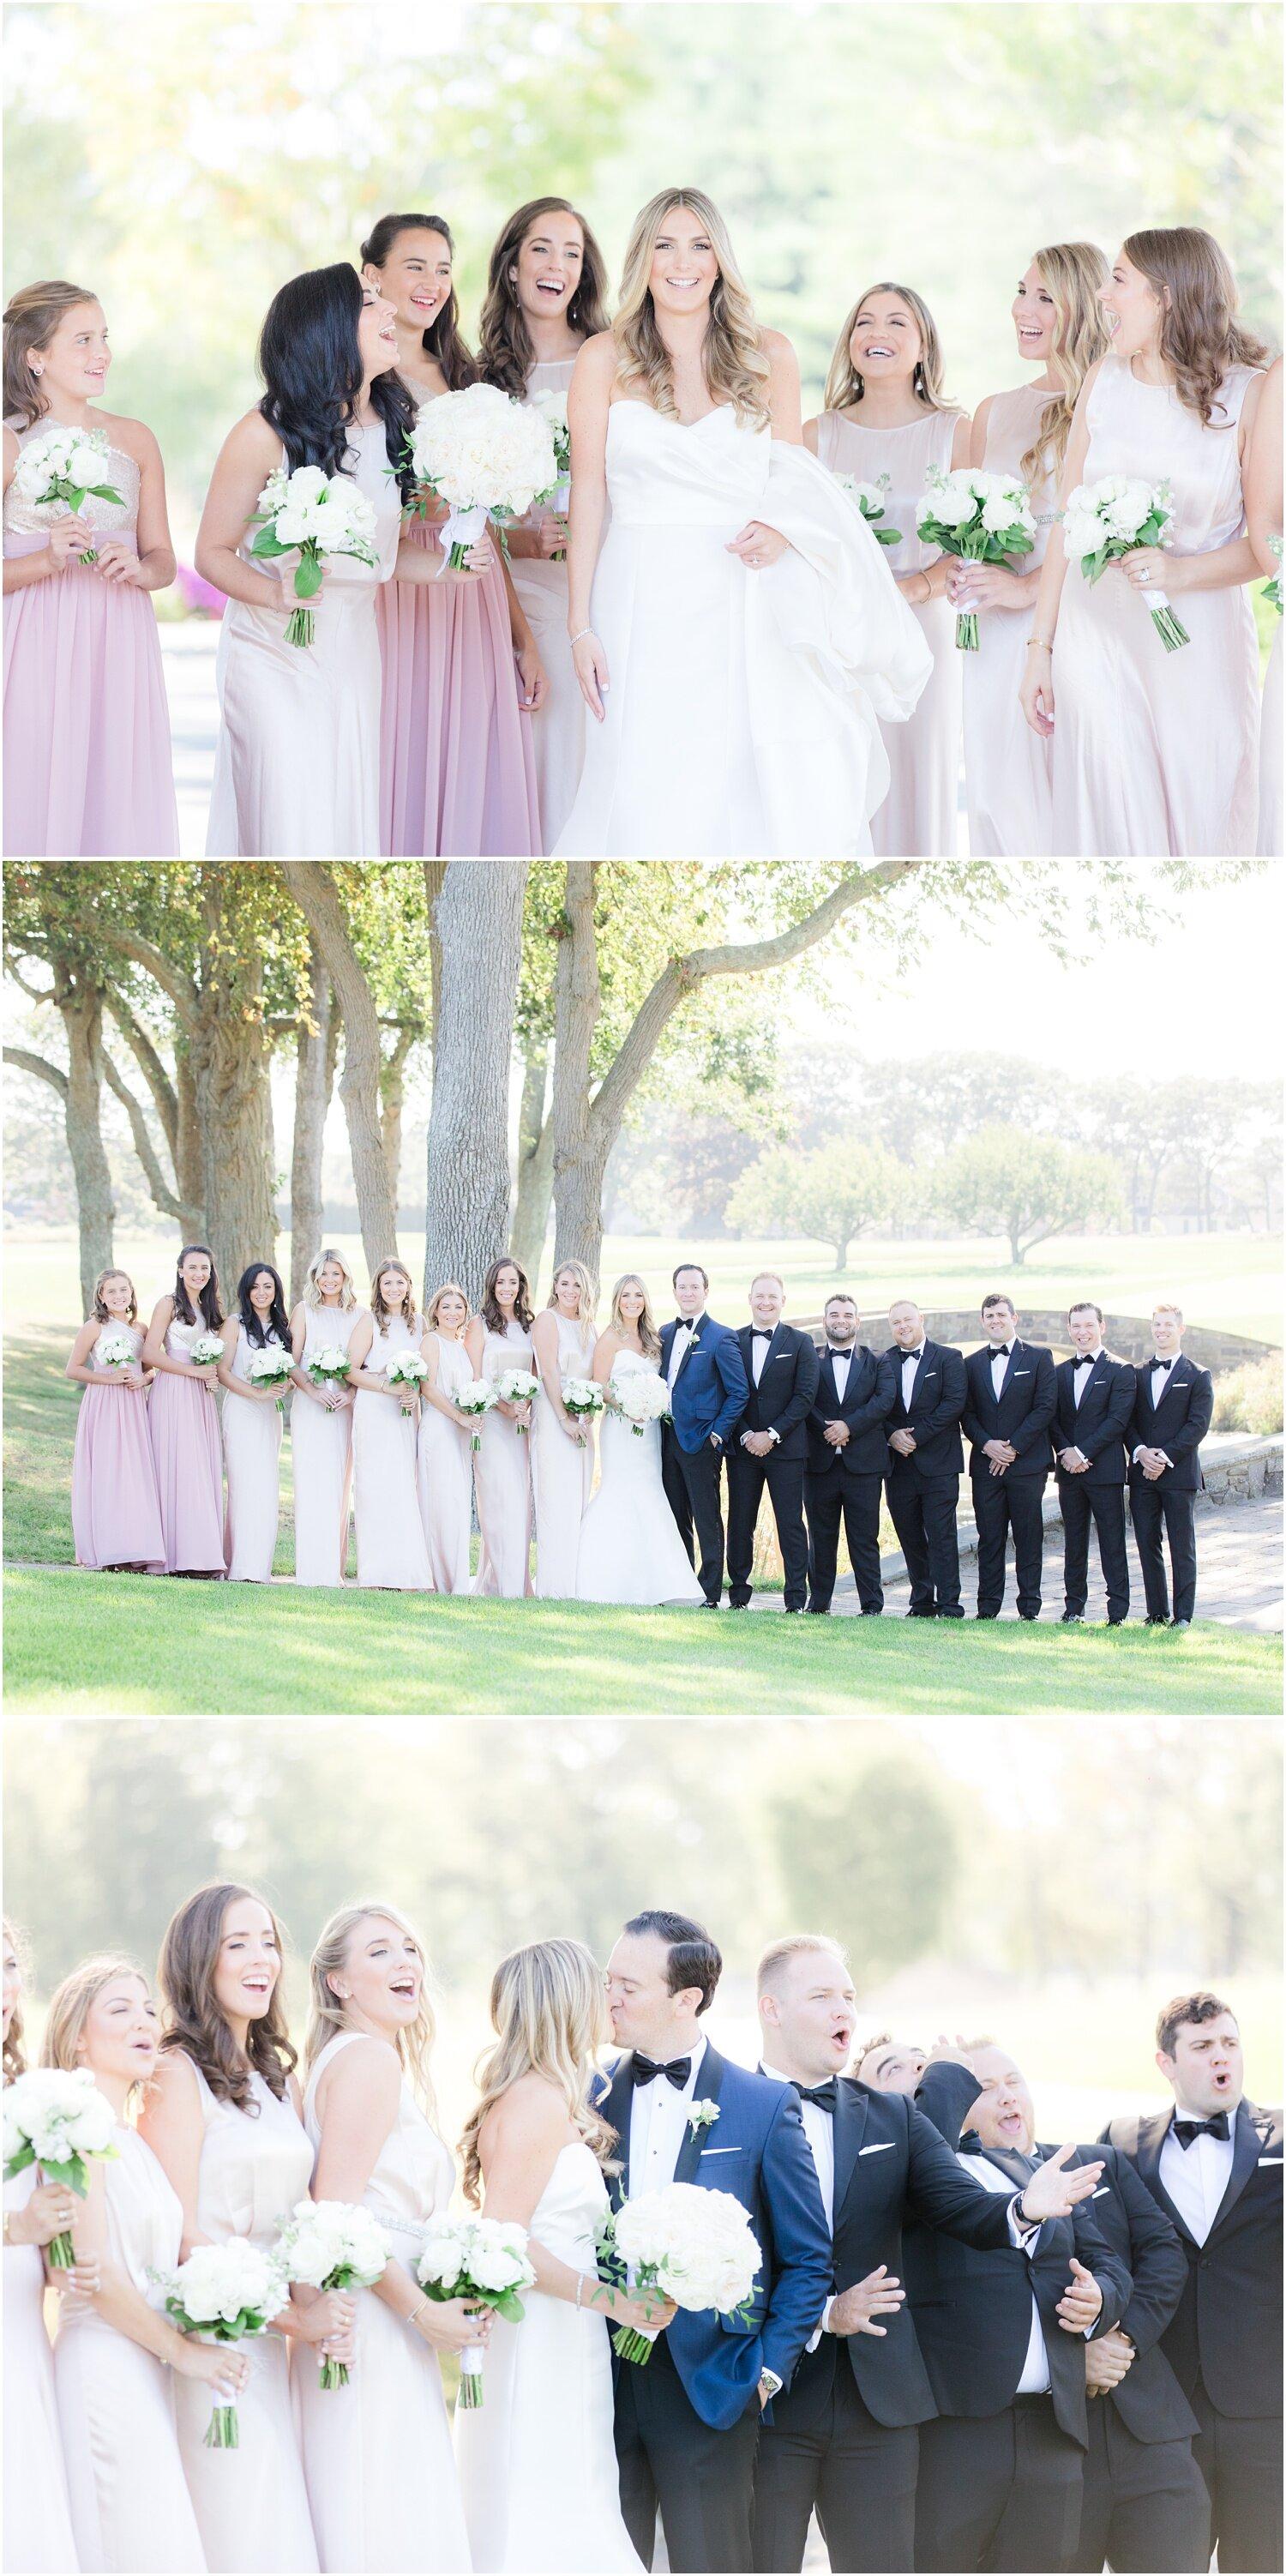 Fun Bridal party photos on the golf course at Spring Lake Golf Club